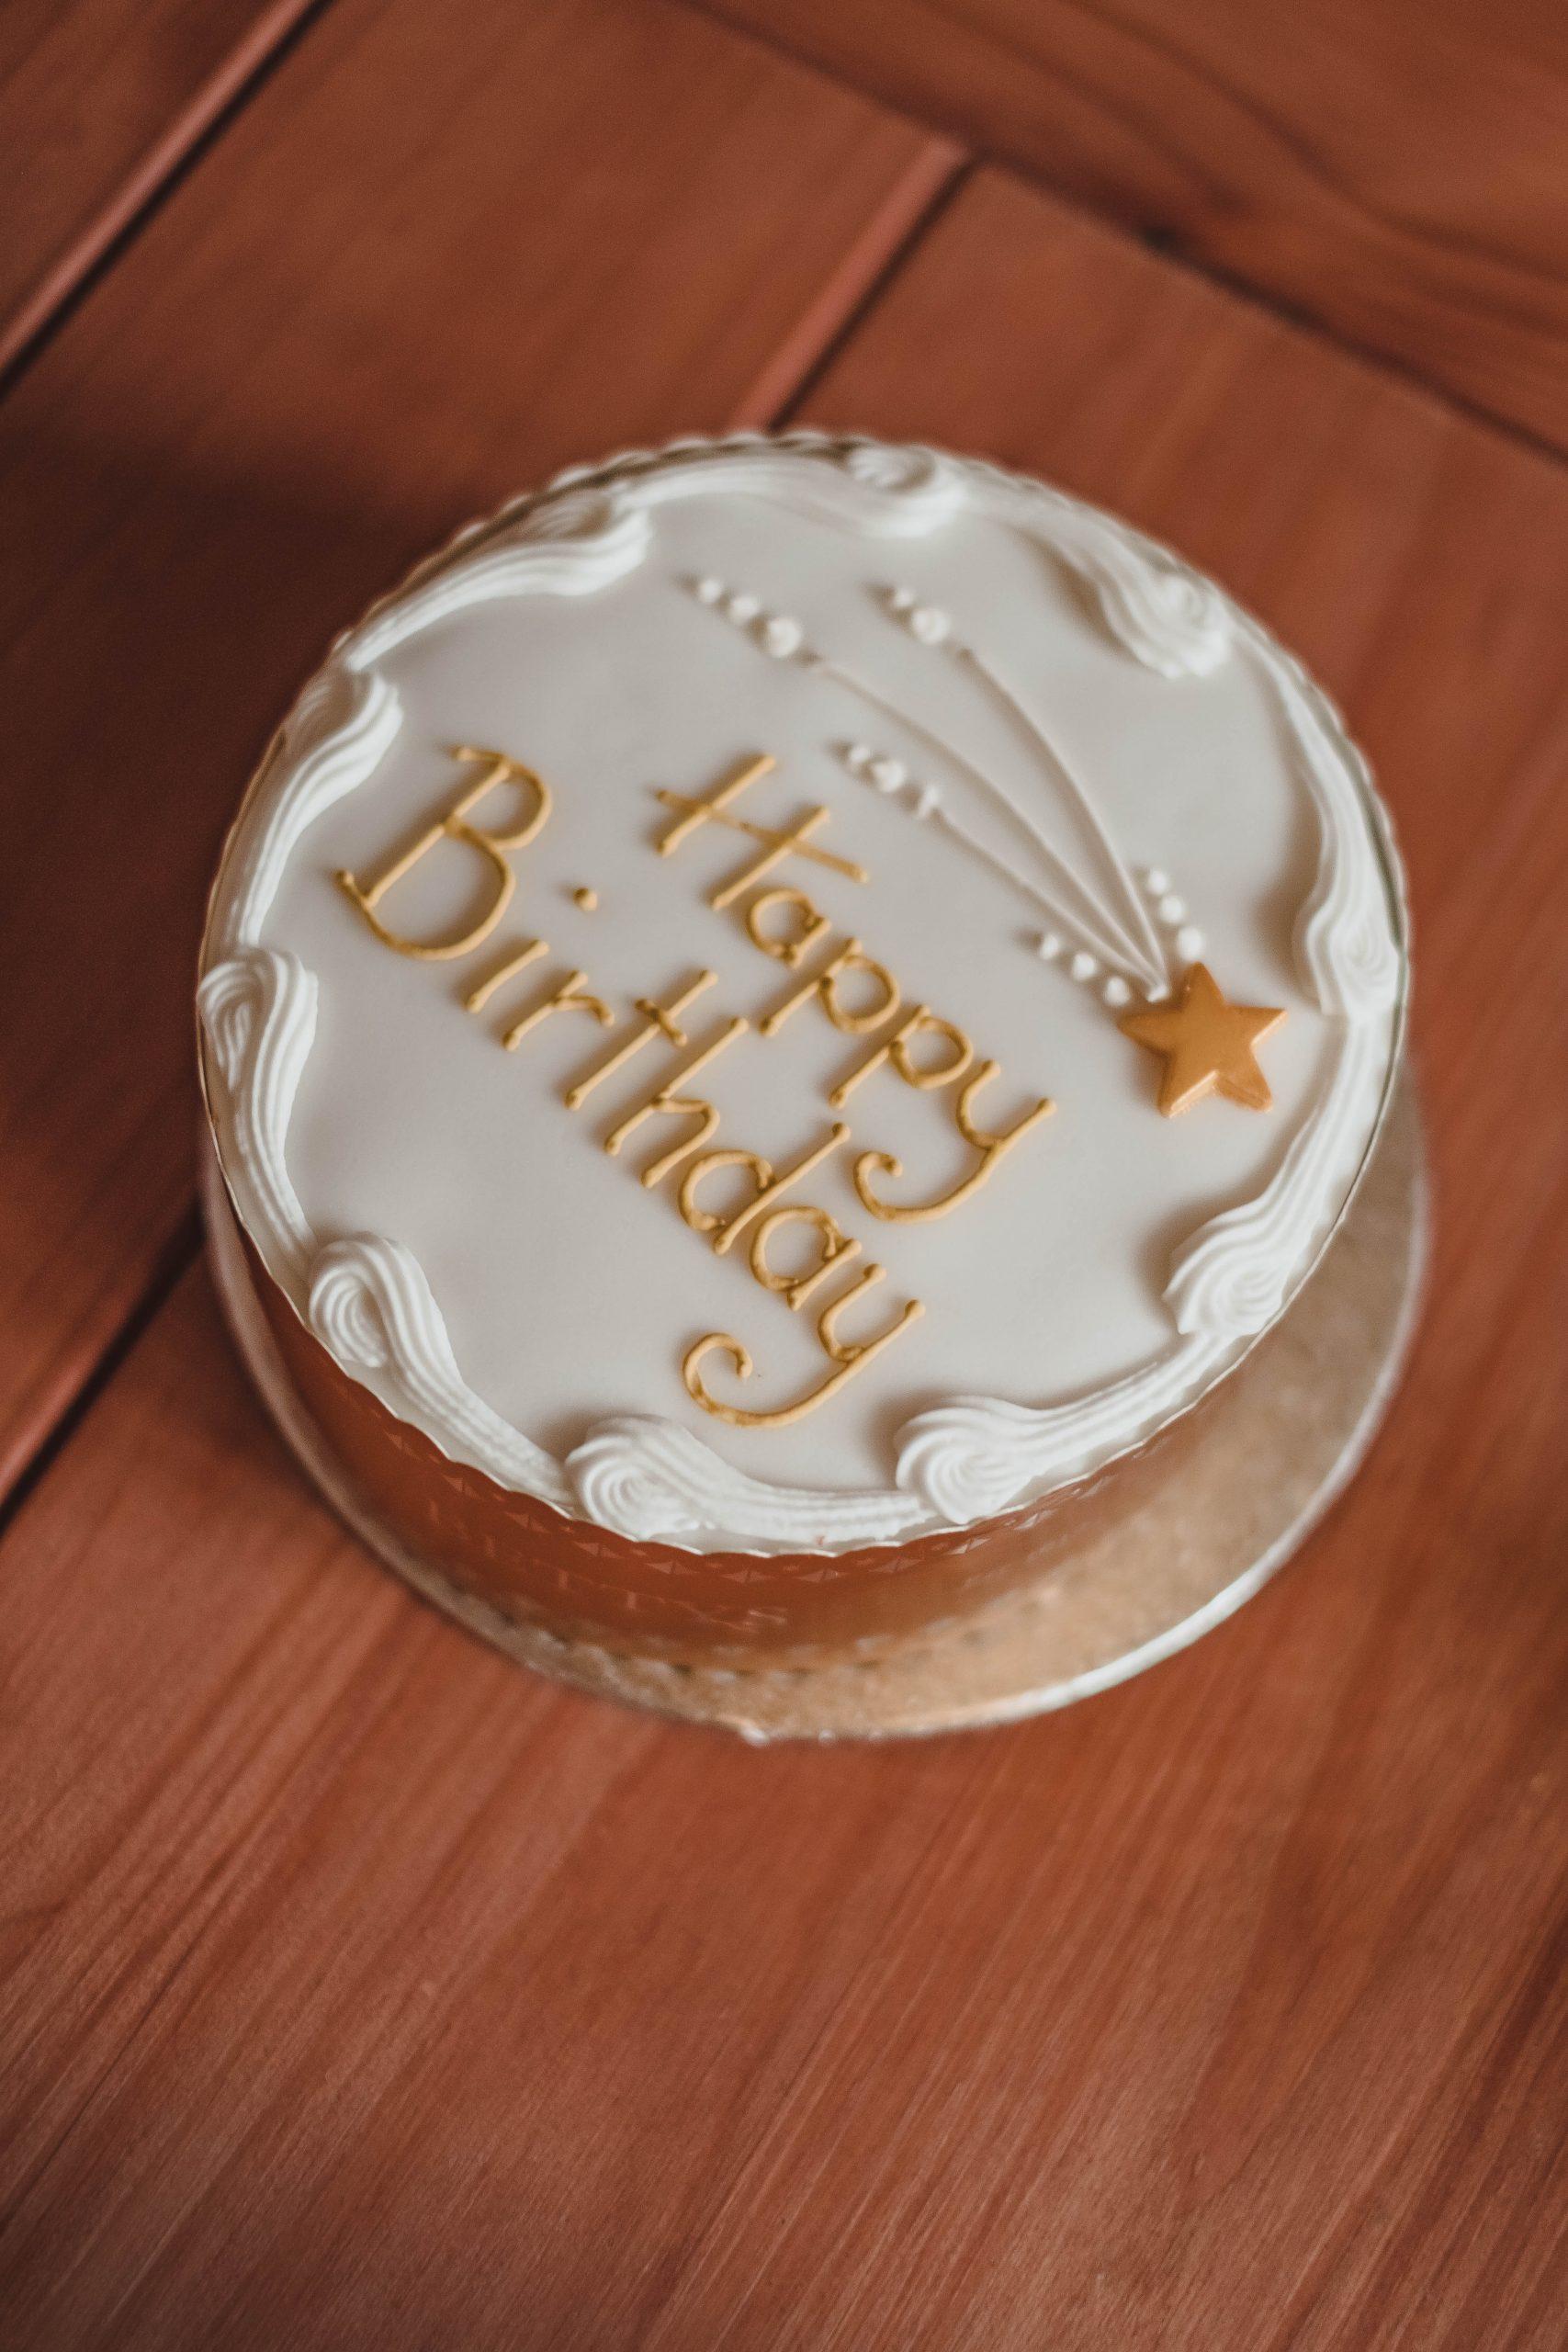 Lockdown birthday, Bettys Birthday Cake, Teacup, Lilac Instax Camera, Katie Writes, UK Lifestyle blogs,